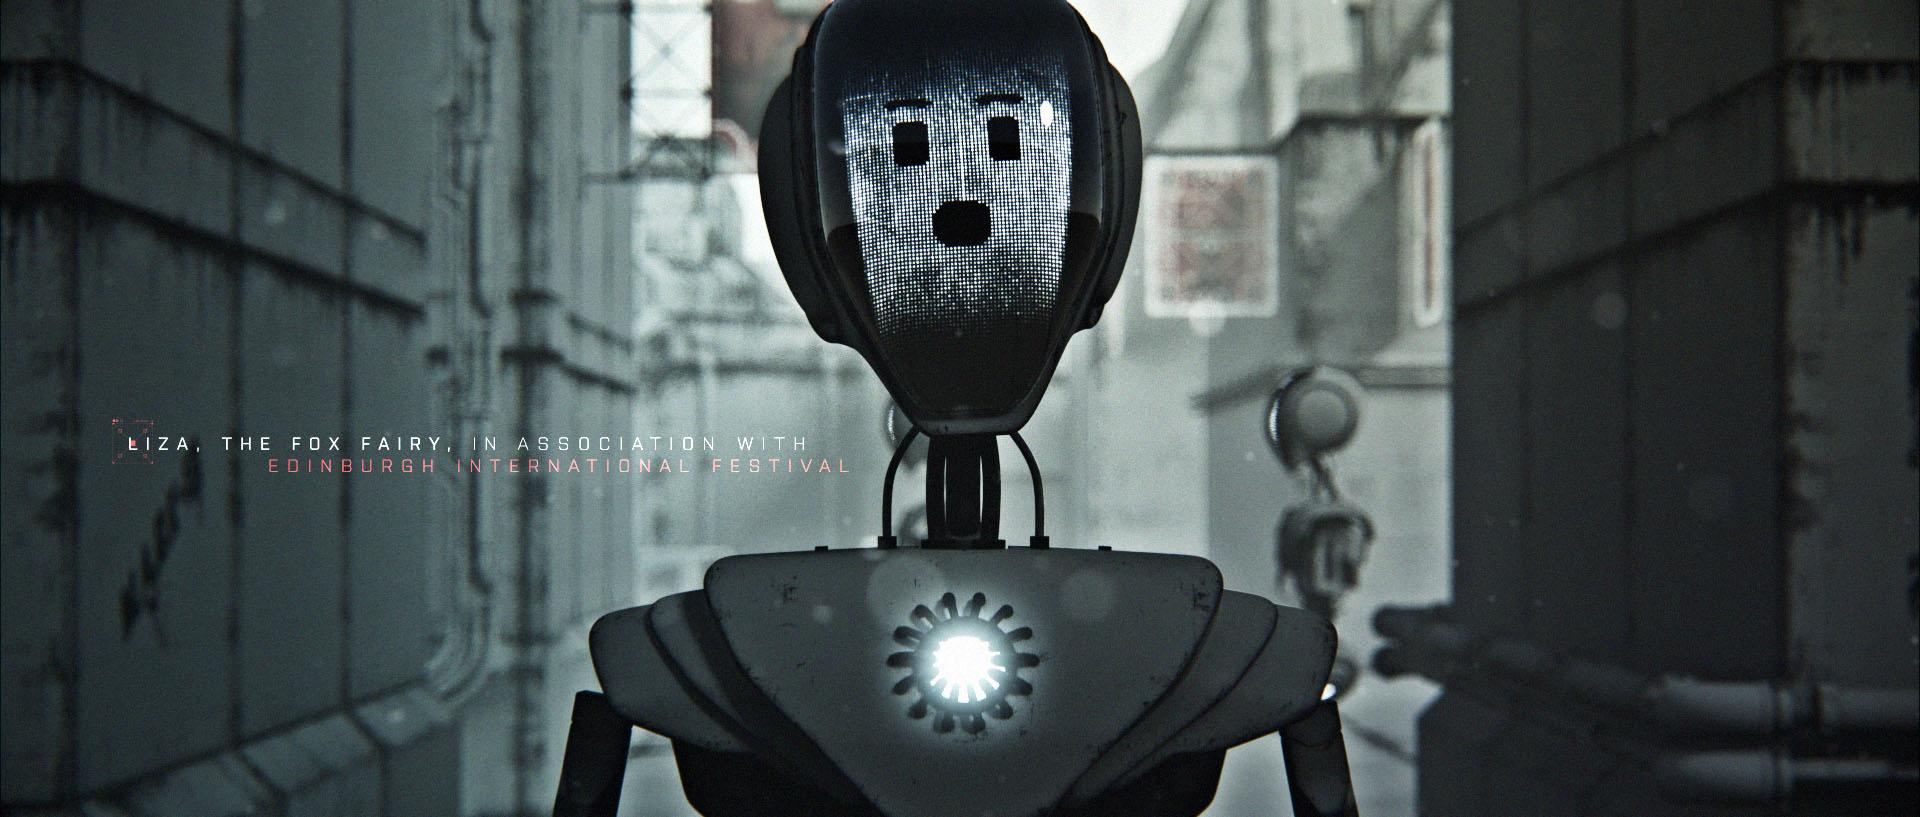 Sci-Fi-London_0010_11.jpg